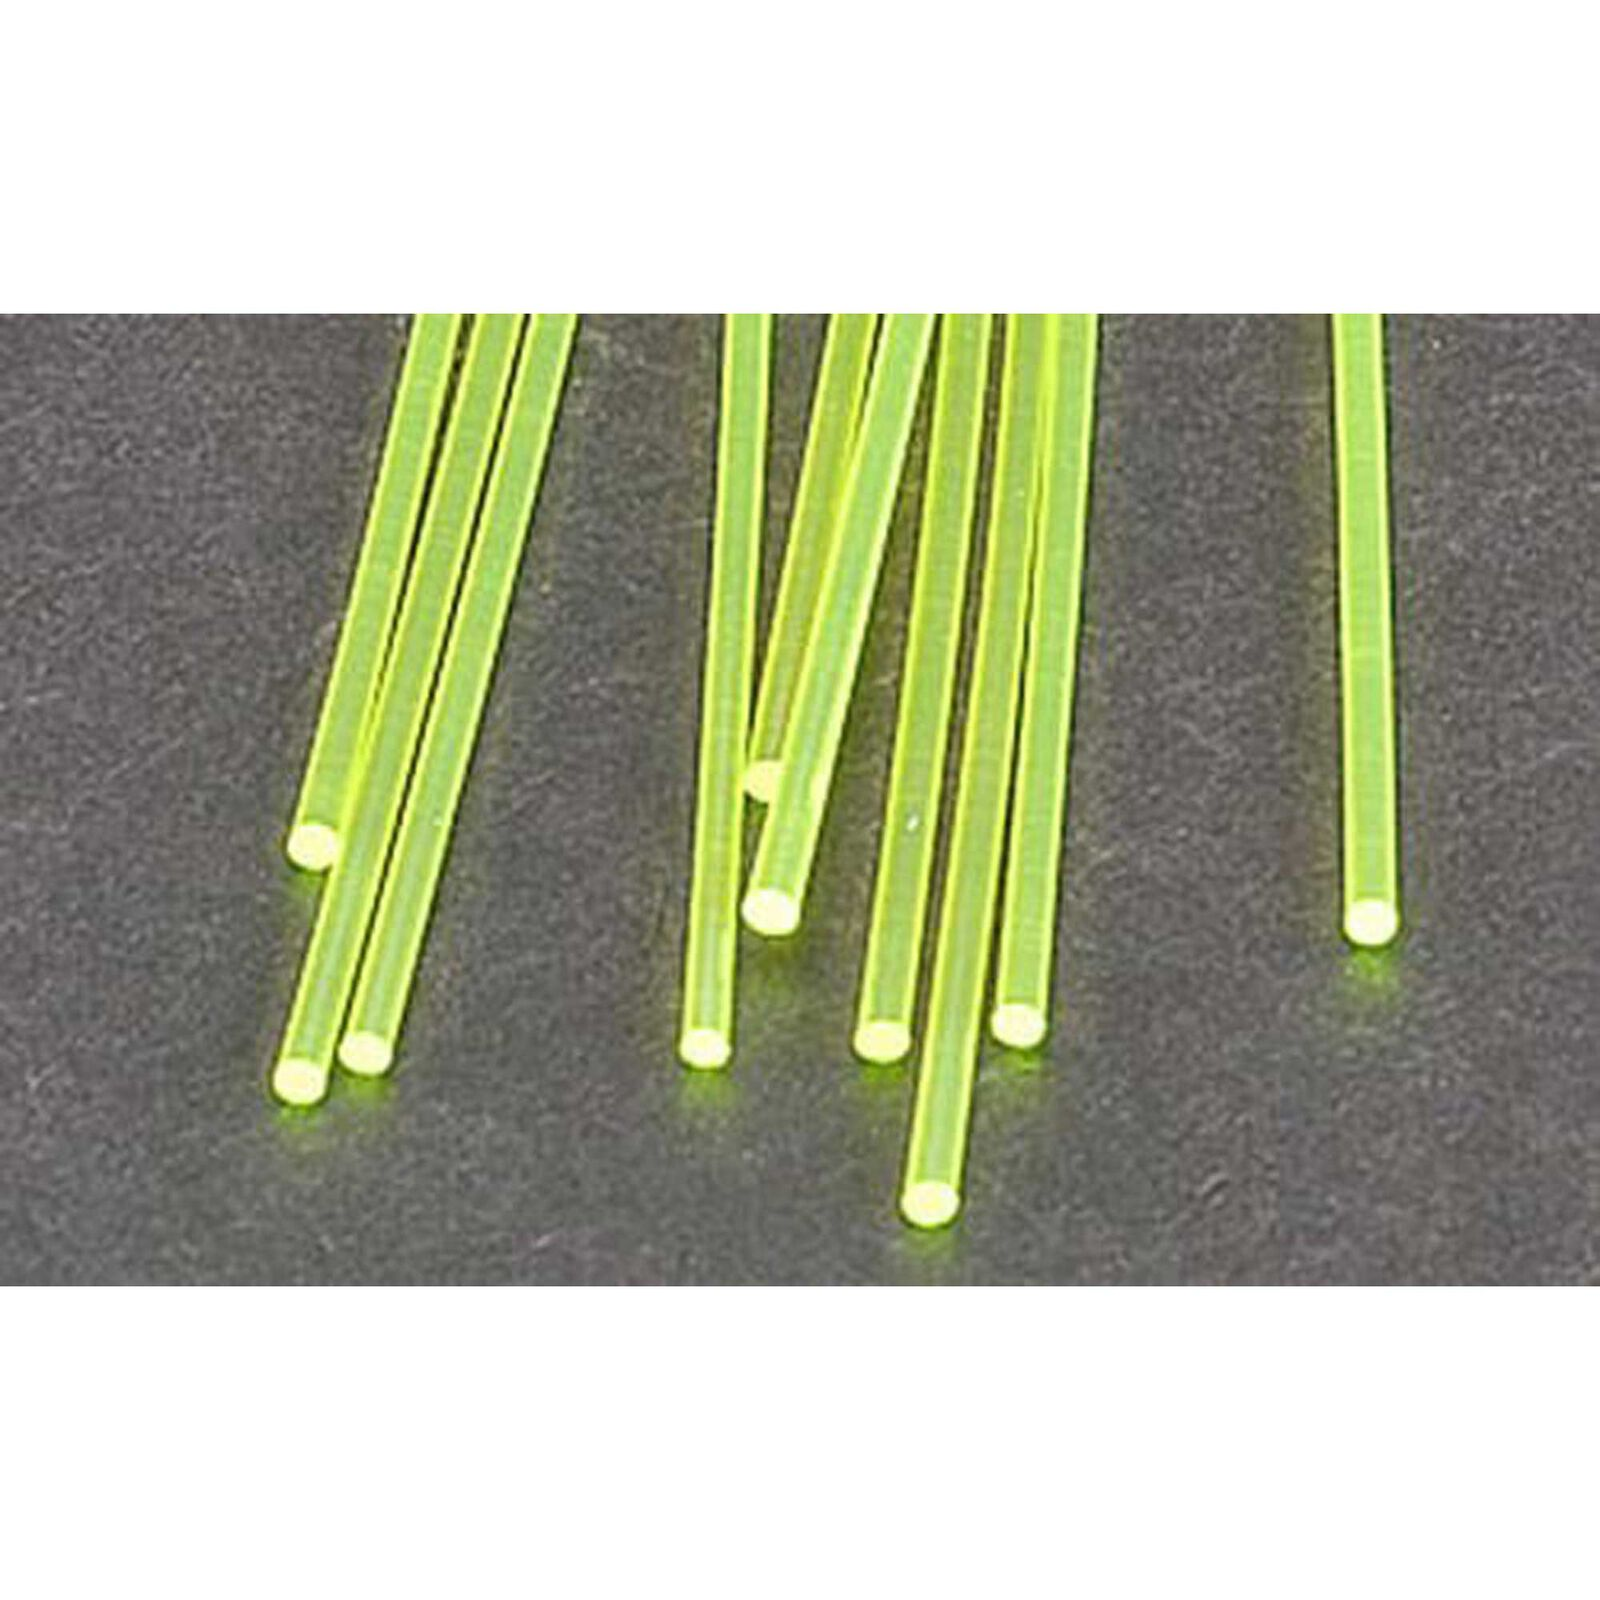 "FARG-3H Fluor Grn Rod,3/32"" (8)"